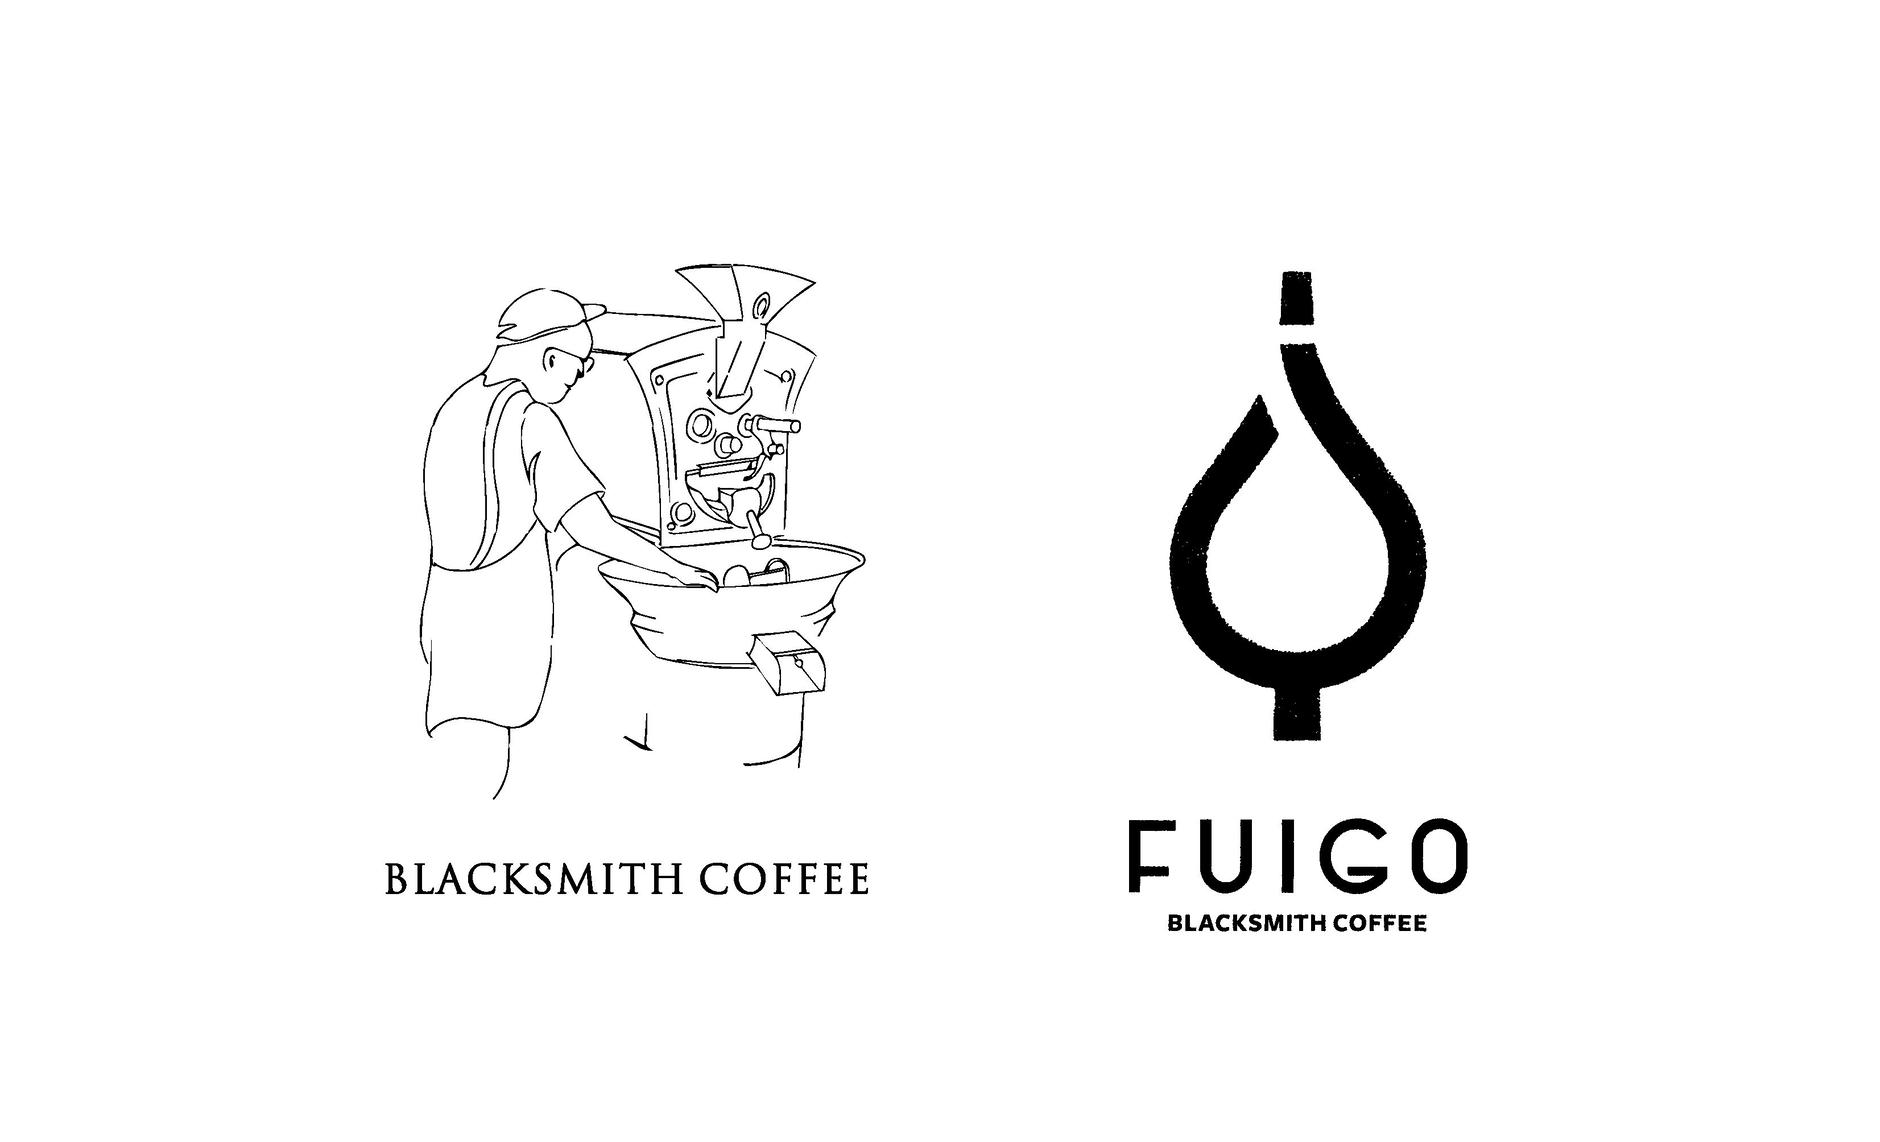 BLACKSMITH COFFEE